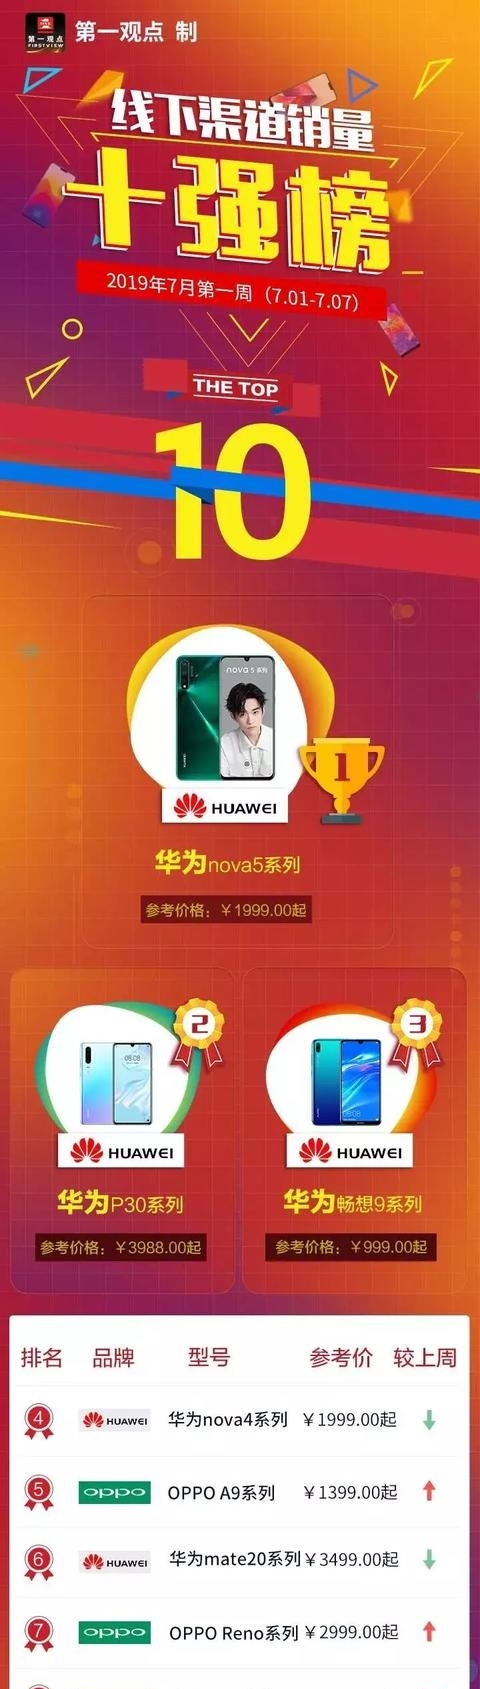 <b>线下手机销量跌幅超3成华为nova5晋级畅销榜新王</b>